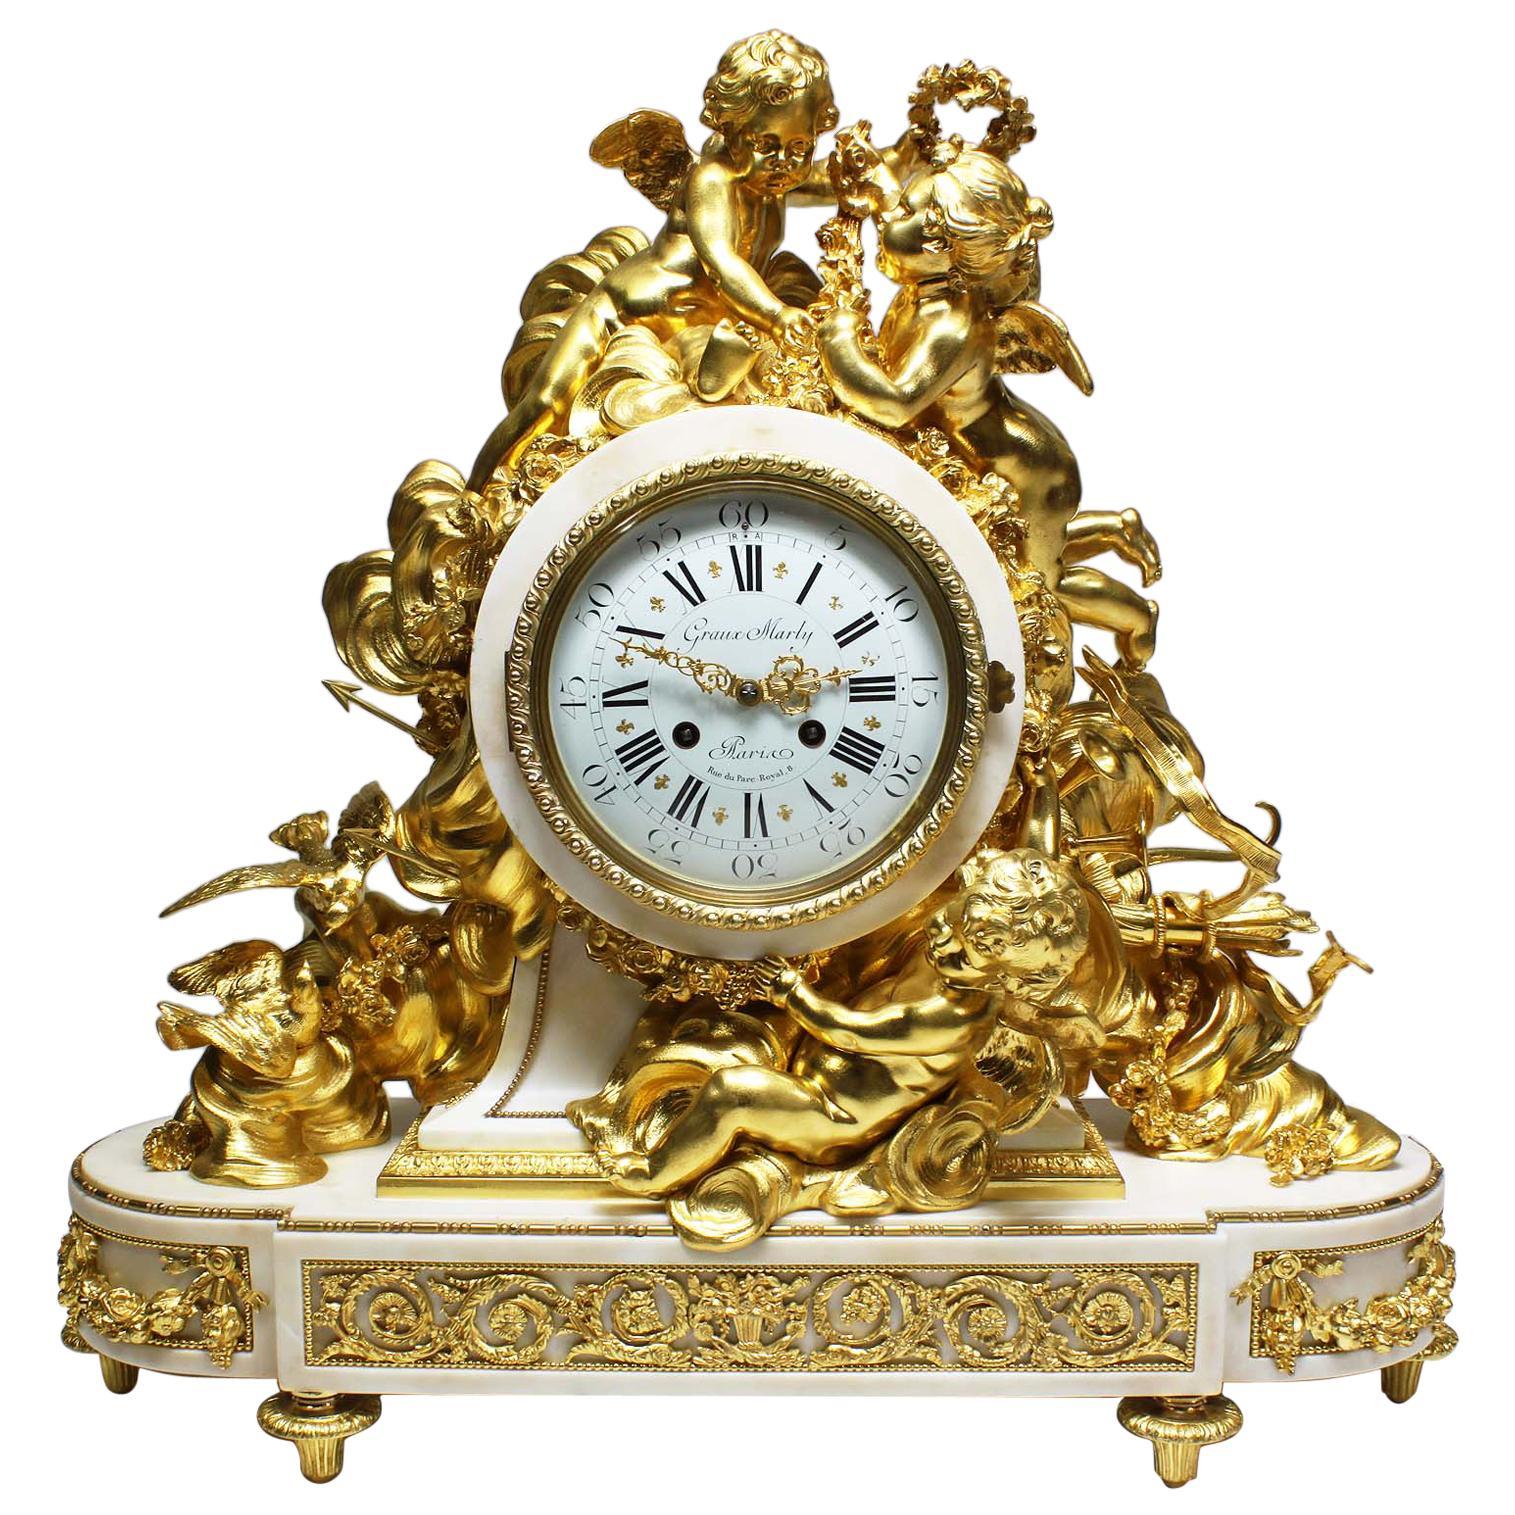 Palatial 19th Century Louis XV Style Ormolu Mantel Cherub Clock Attr. Beurdeley